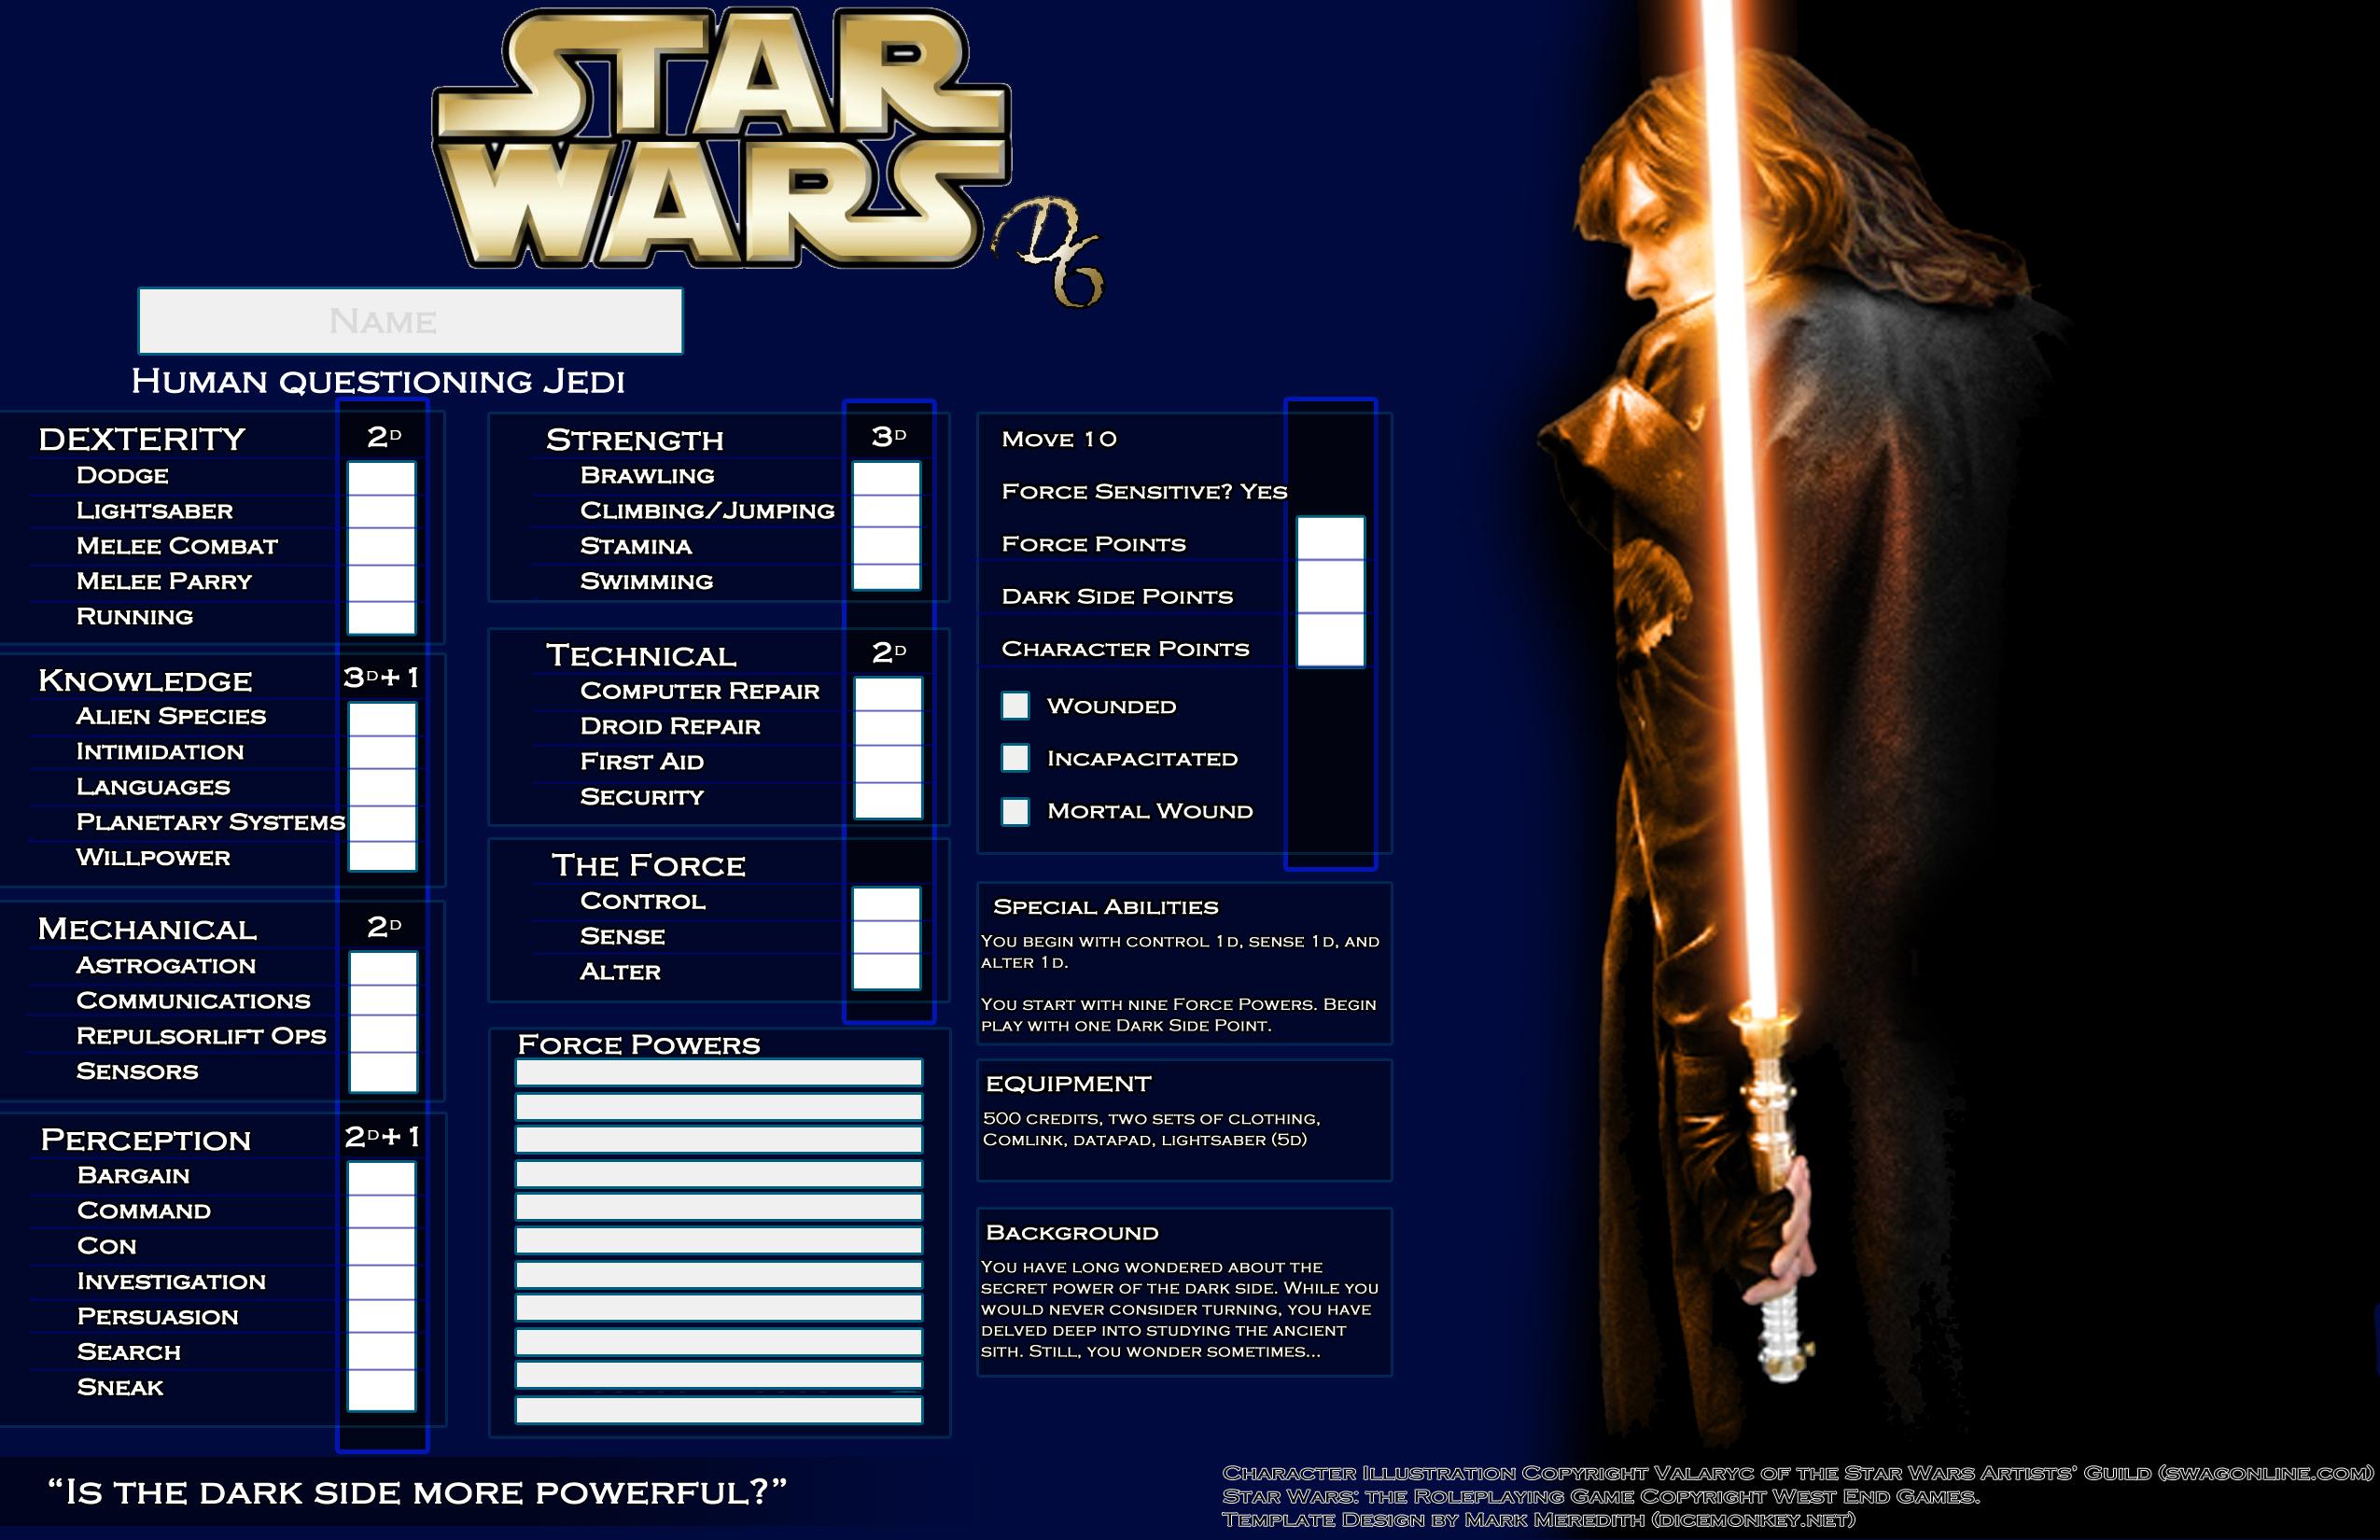 Star Wars D6 Templates – Dice Monkey